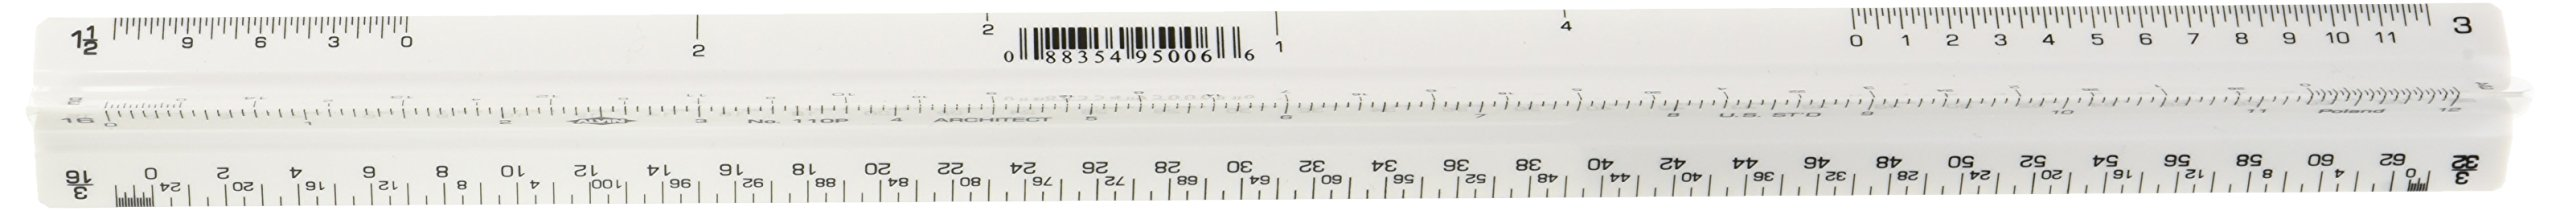 Alvin 110P 110 Series 12'' High Impact Plastic Architect Triangular Scale by Alvin (Image #3)